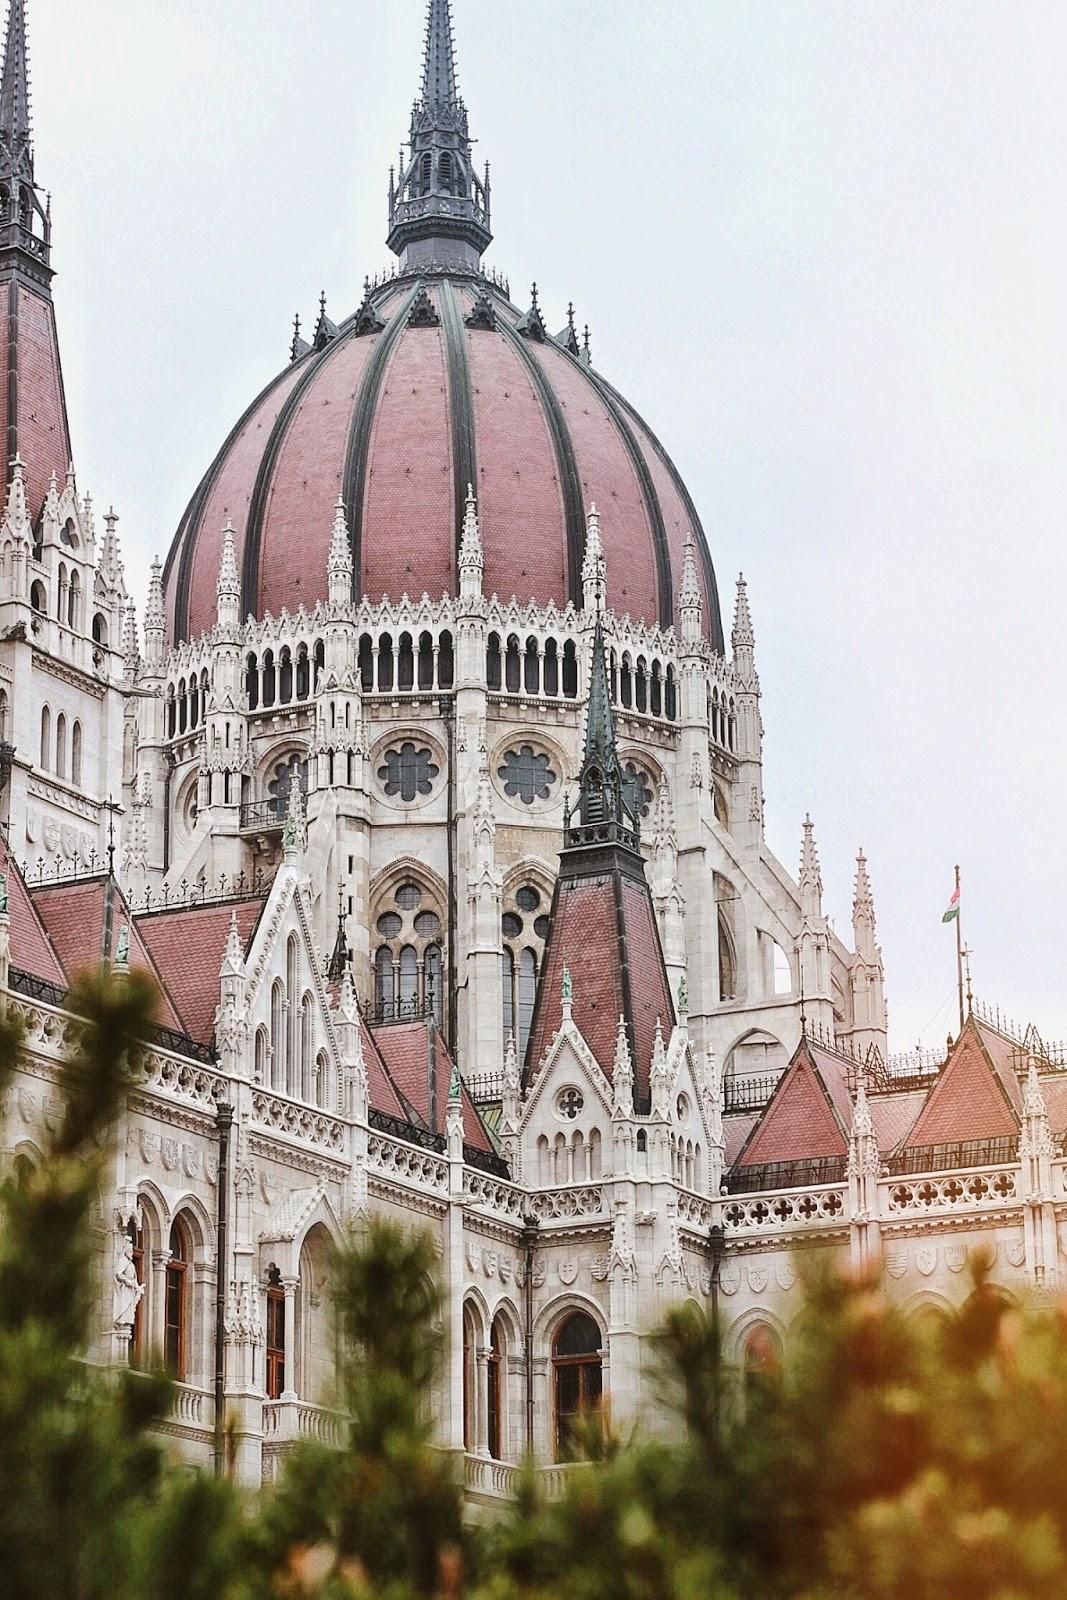 lifesthayle-budapest-parliament-details.JPG